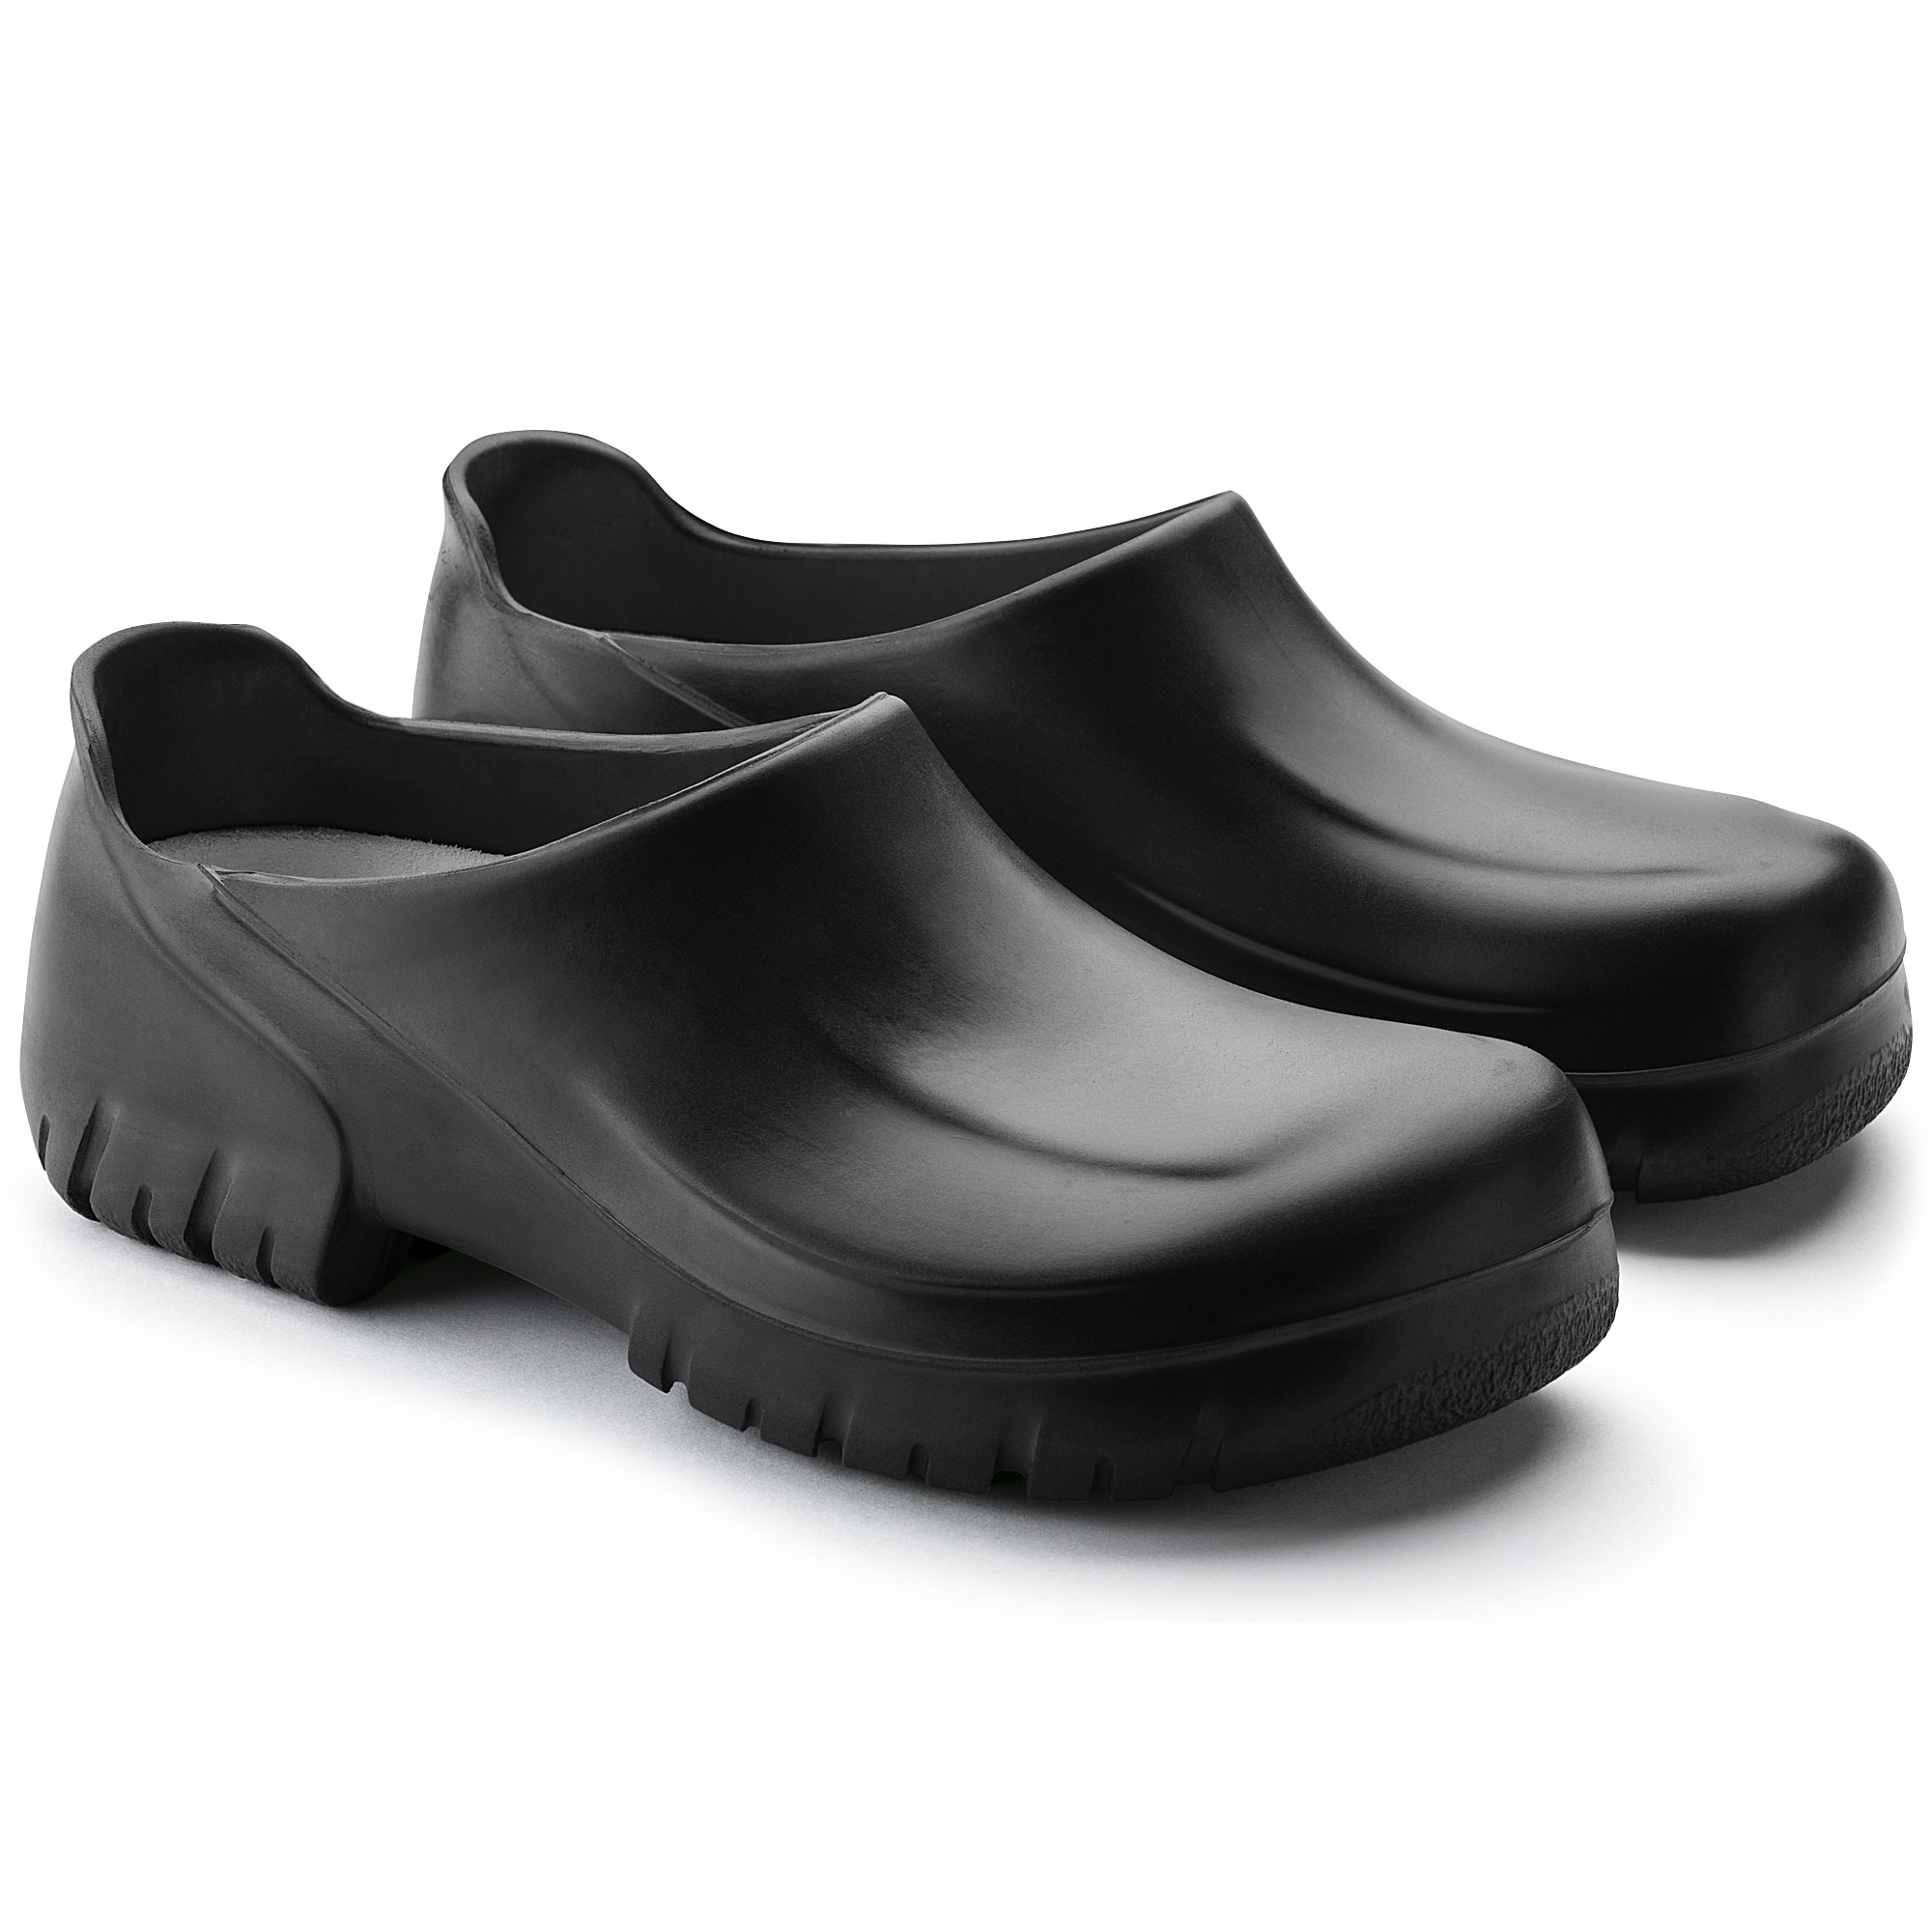 Dockers by Gerli 292550 269335 Sneakers Halbschuhe Gr.45